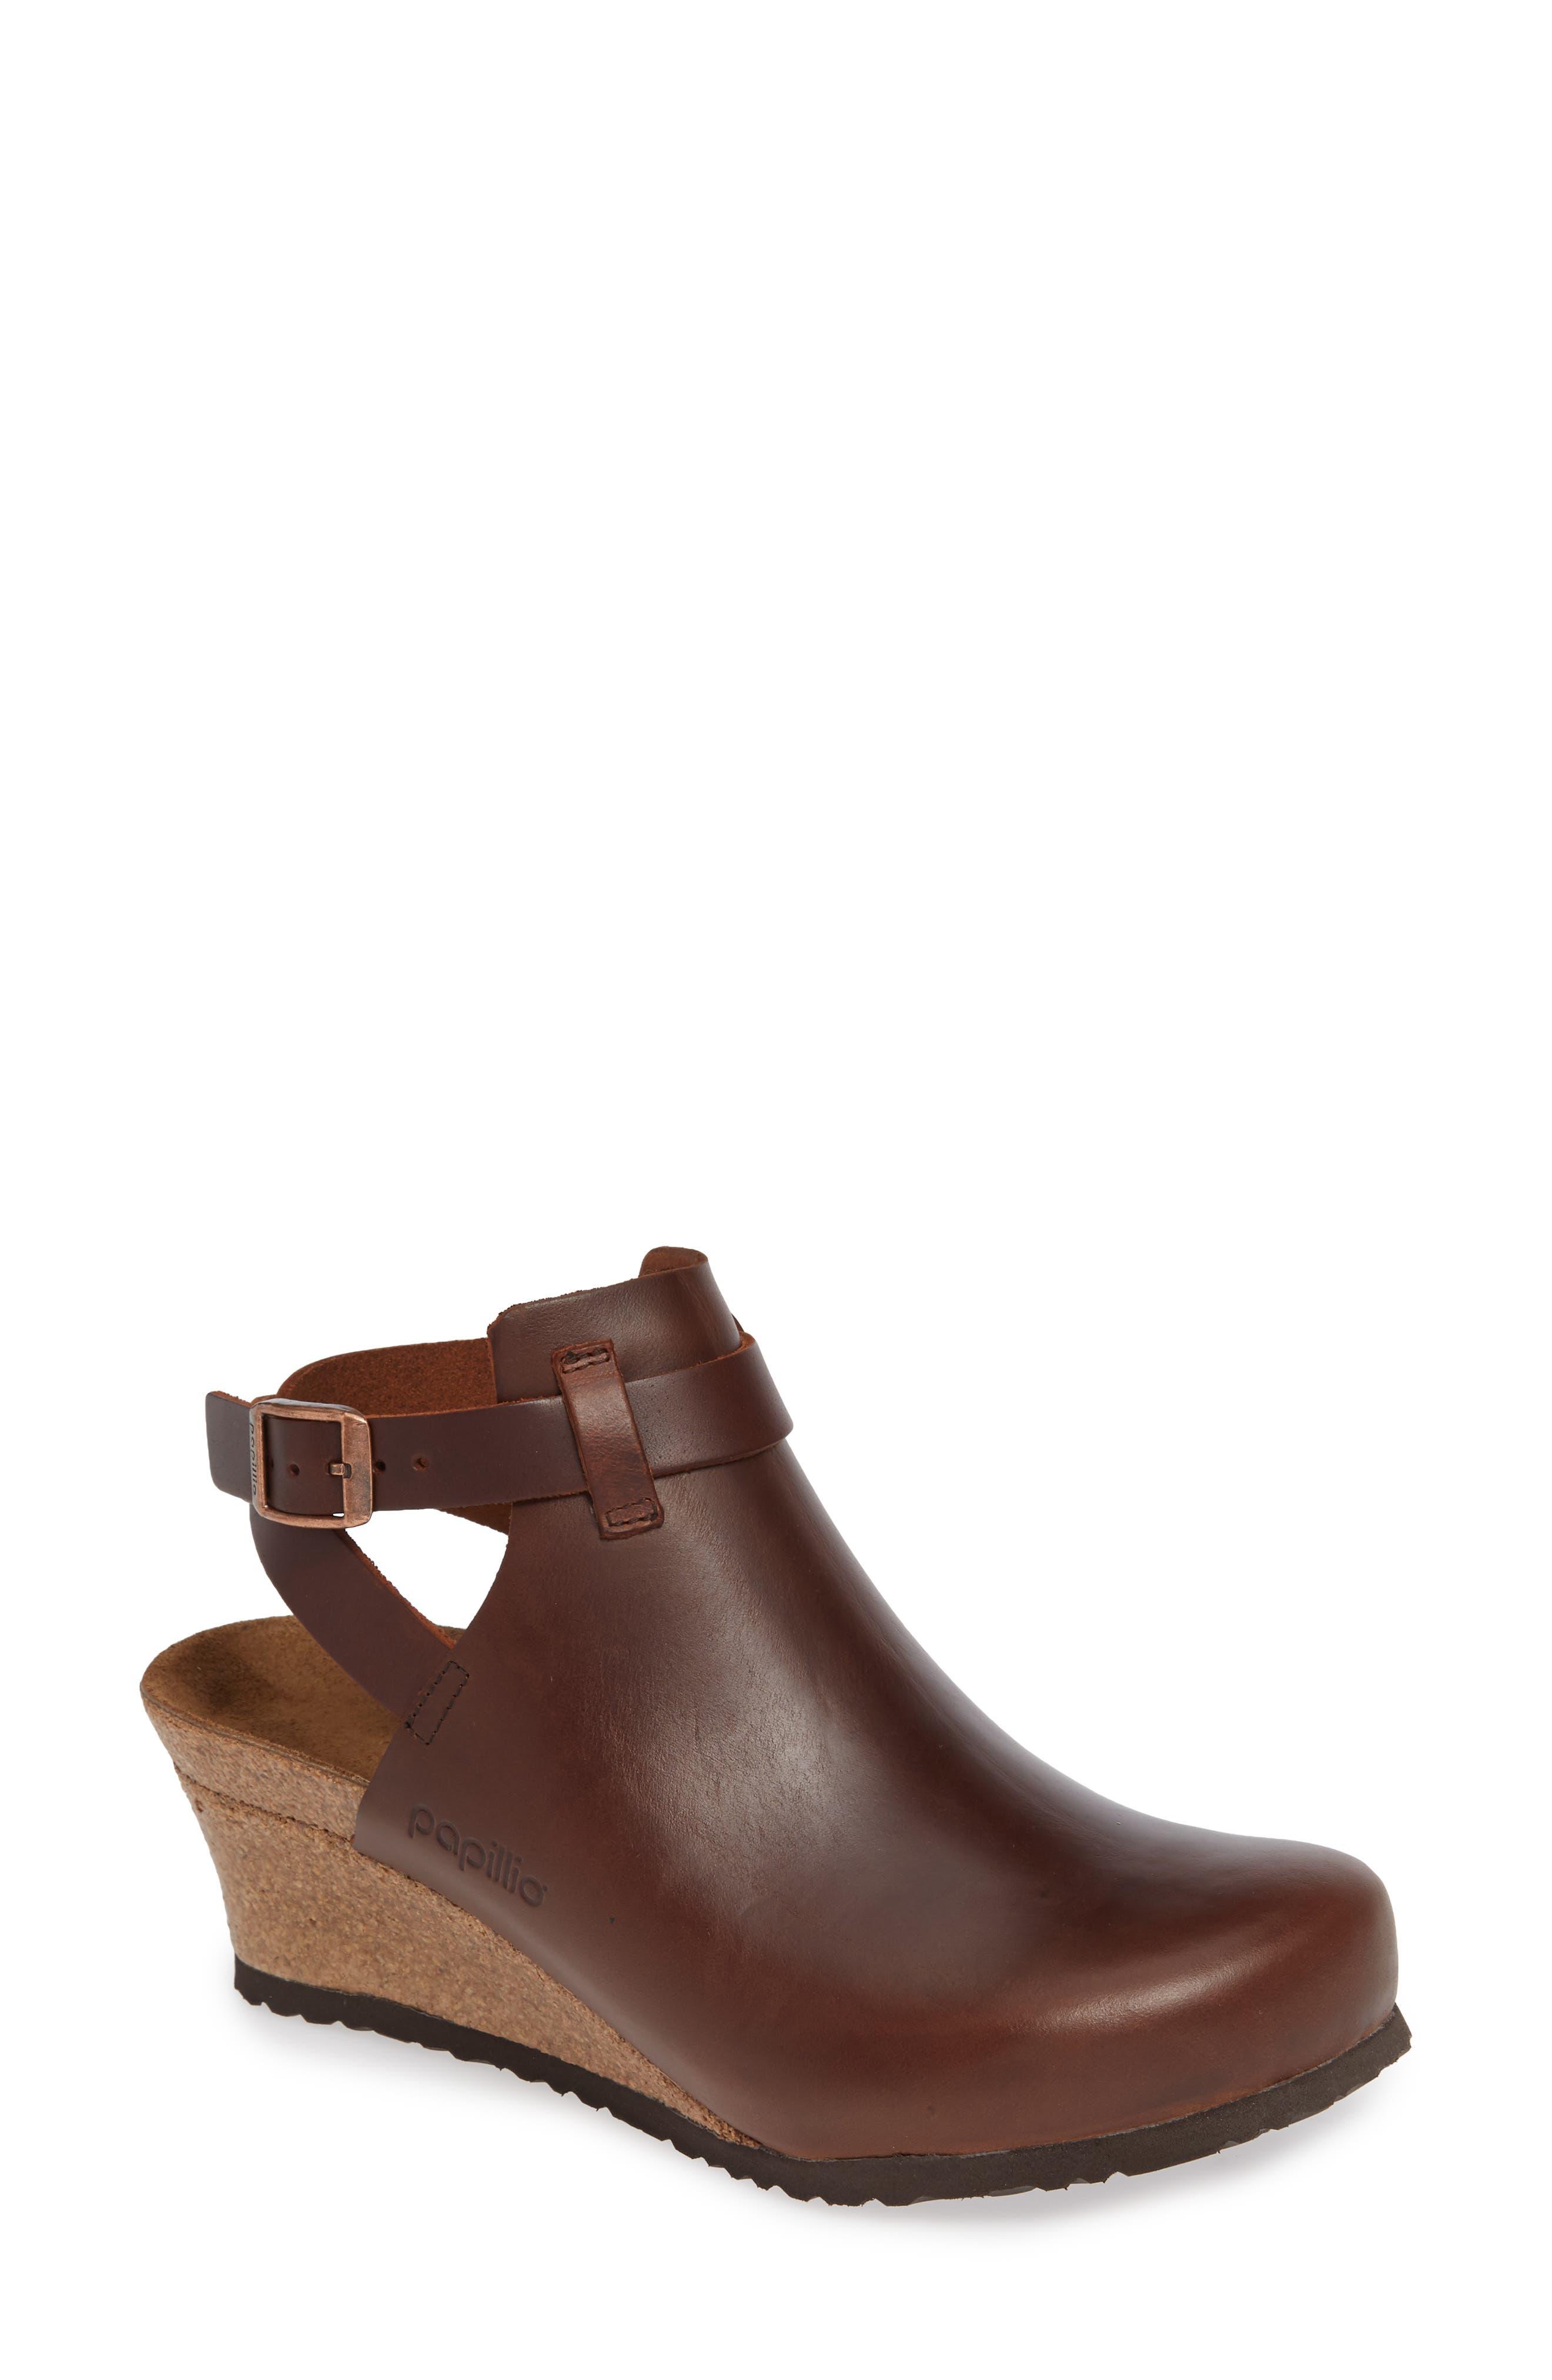 Esra Wedge Clog,                         Main,                         color, Cognac Leather